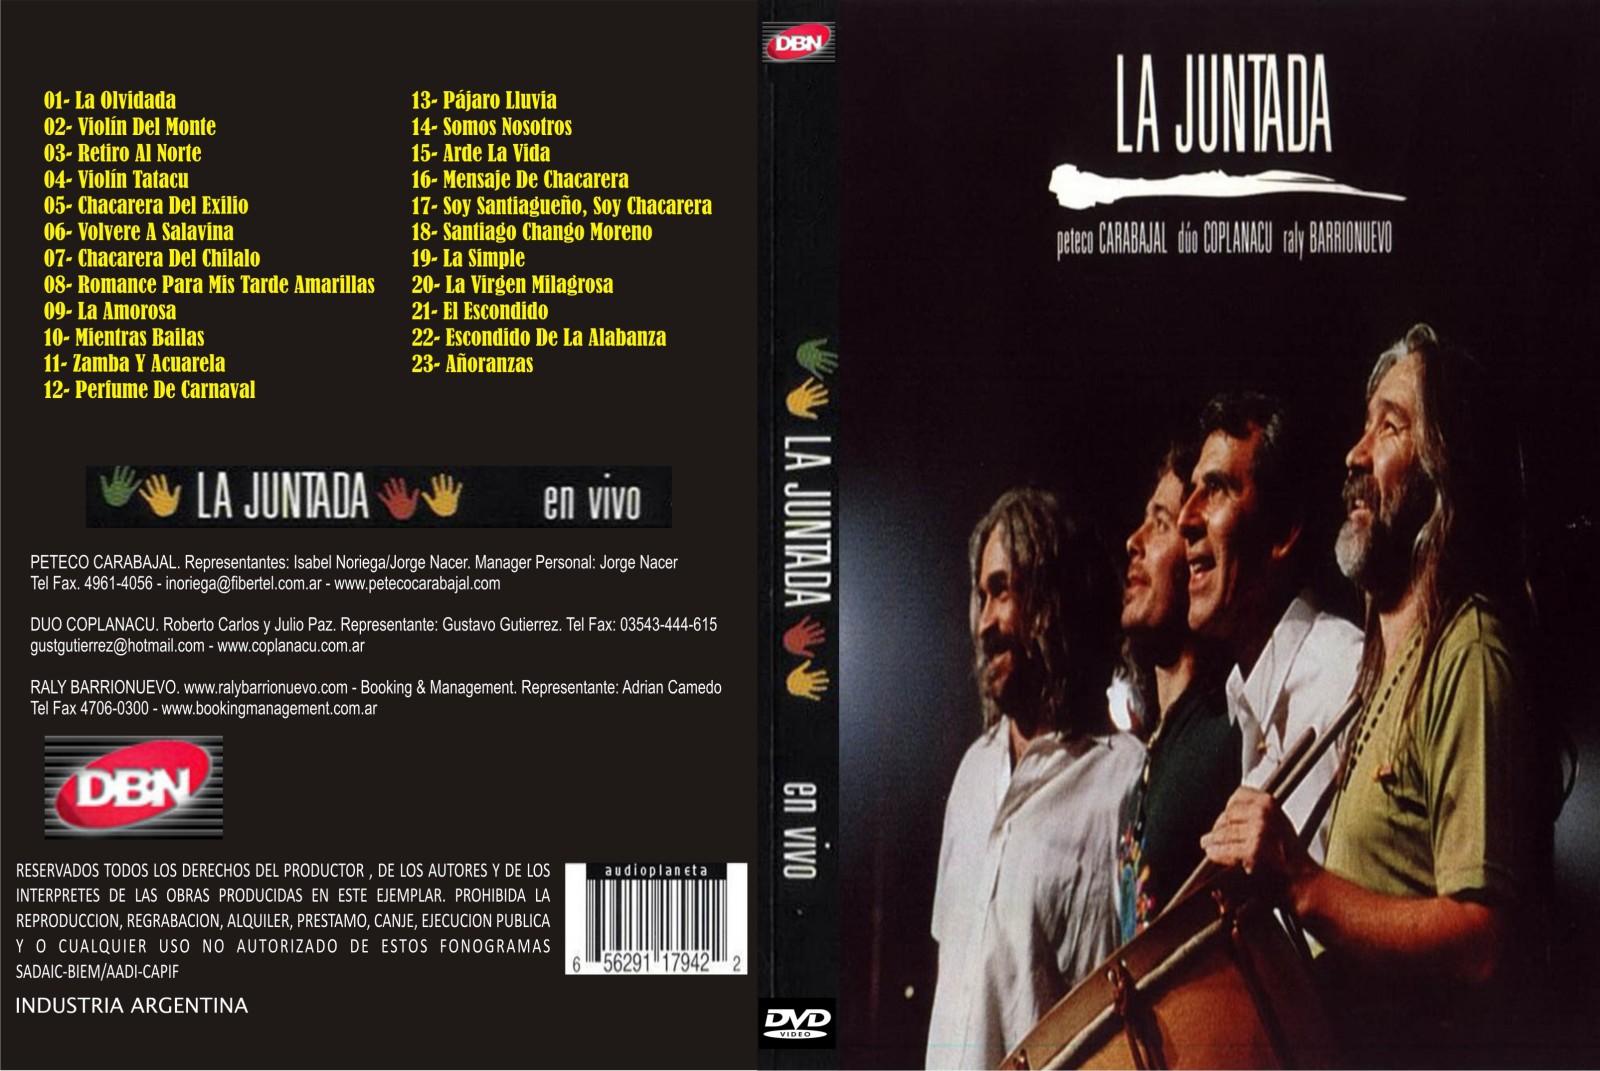 http://1.bp.blogspot.com/_PiUVny6RPwY/S_6Tir-yfWI/AAAAAAAAAqI/Rp_1zXxT7rA/s1600/La+Juntada.jpg